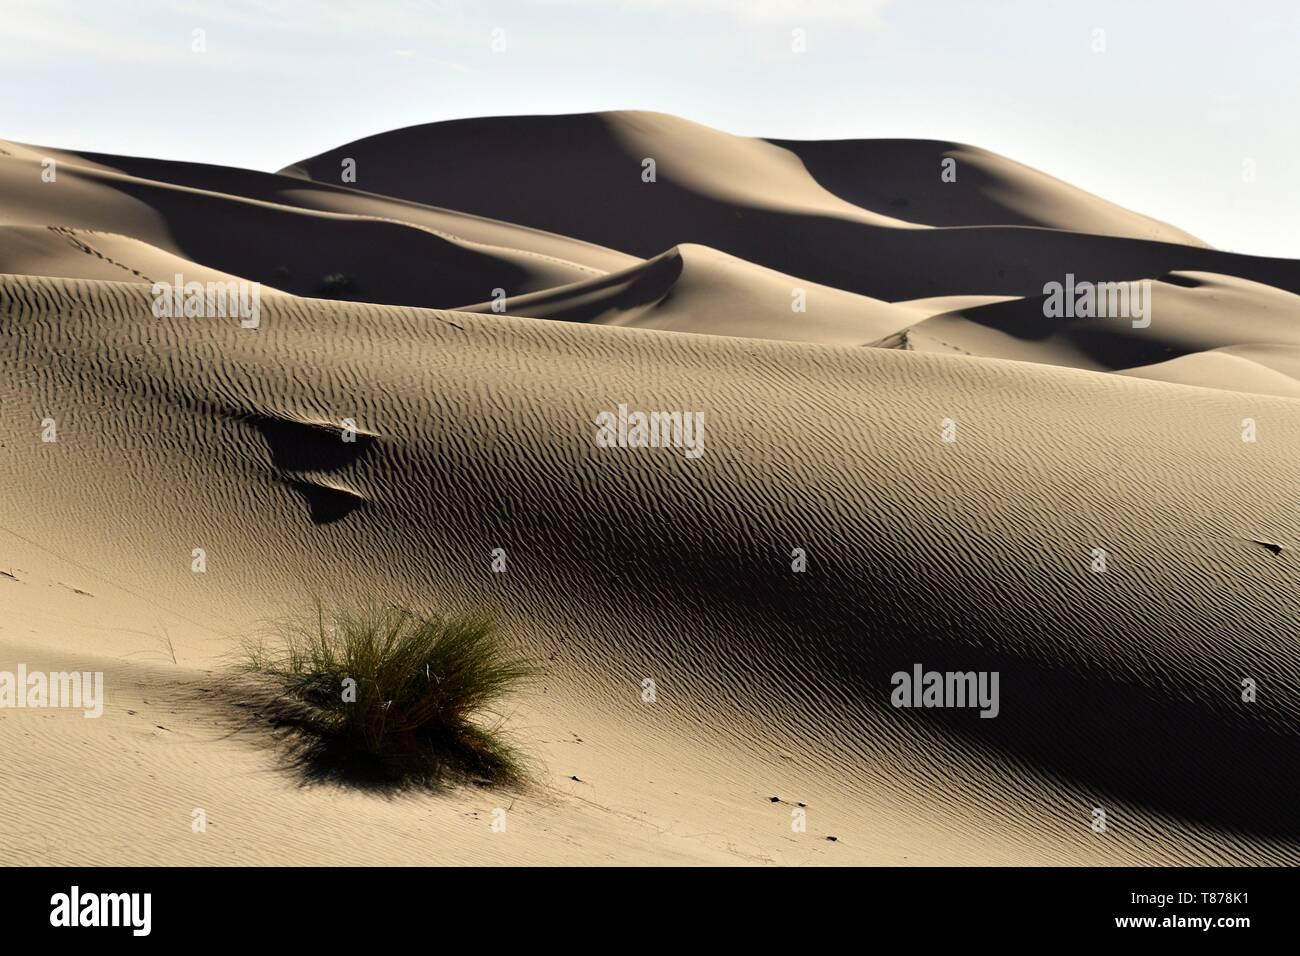 Morocco, Tafilalet region, Merzouga, erg Chebbi dunes - Stock Image